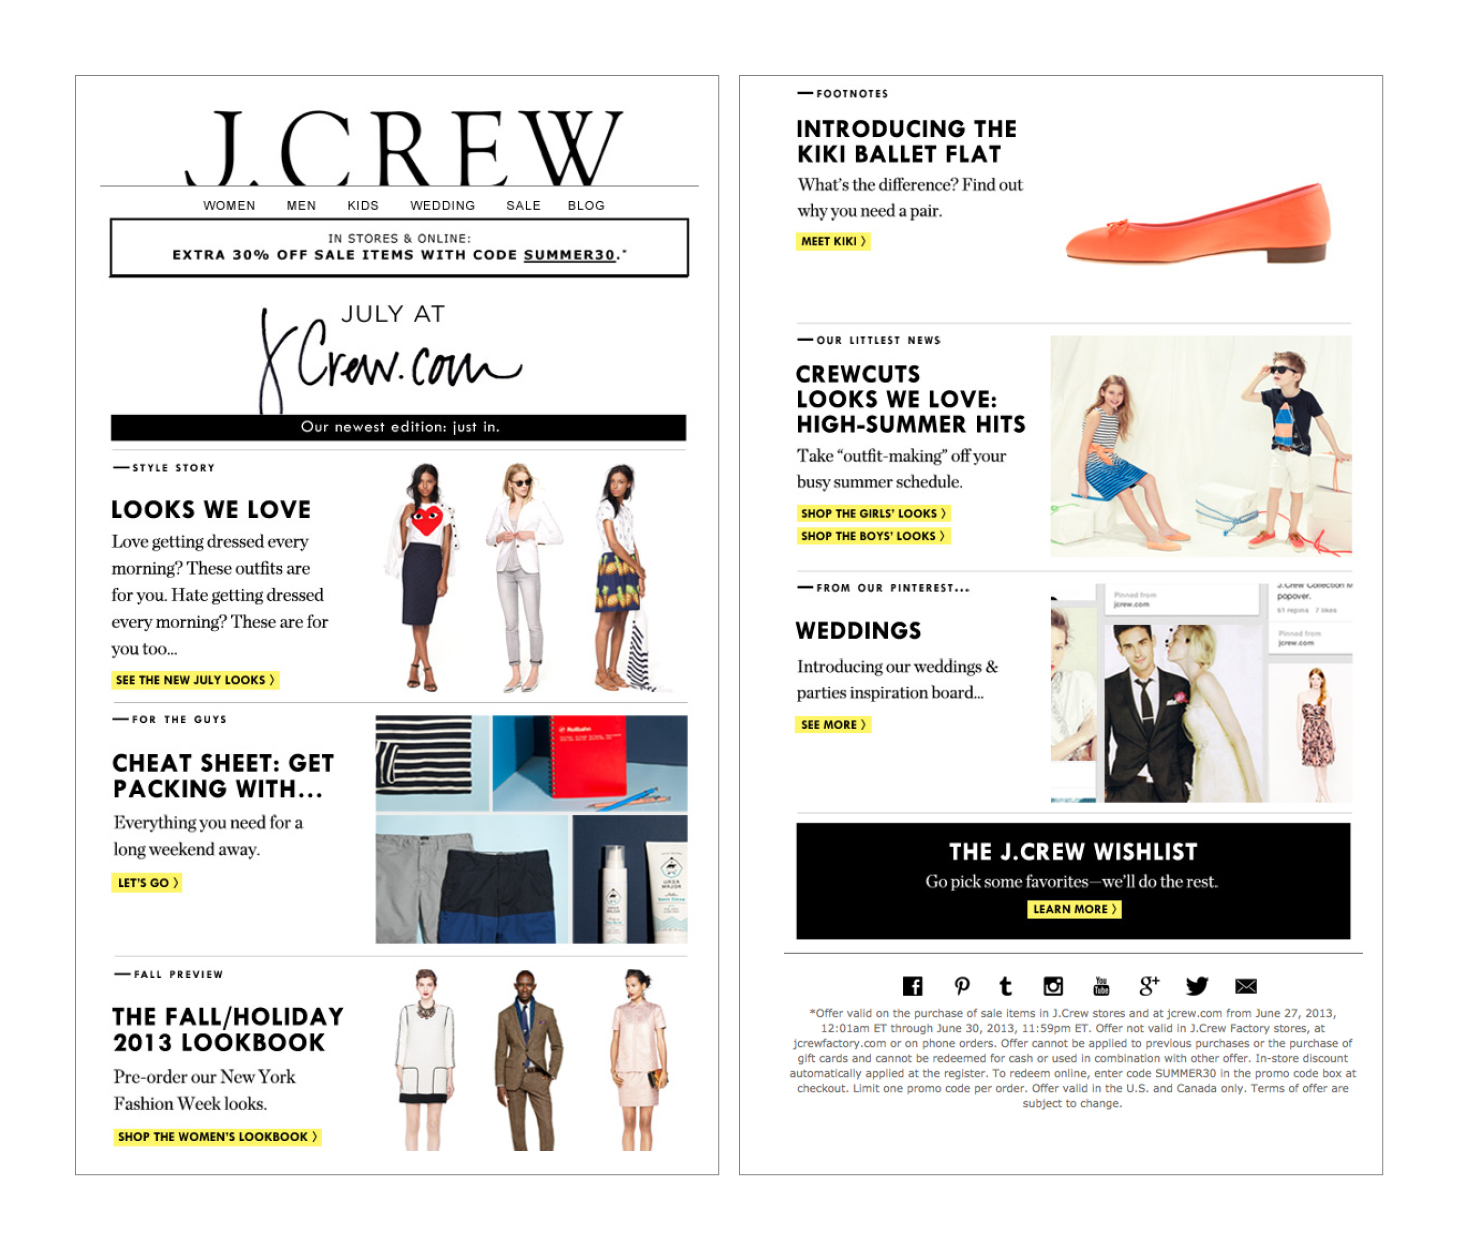 dcwdesign_JCREW_digital_email2.jpg